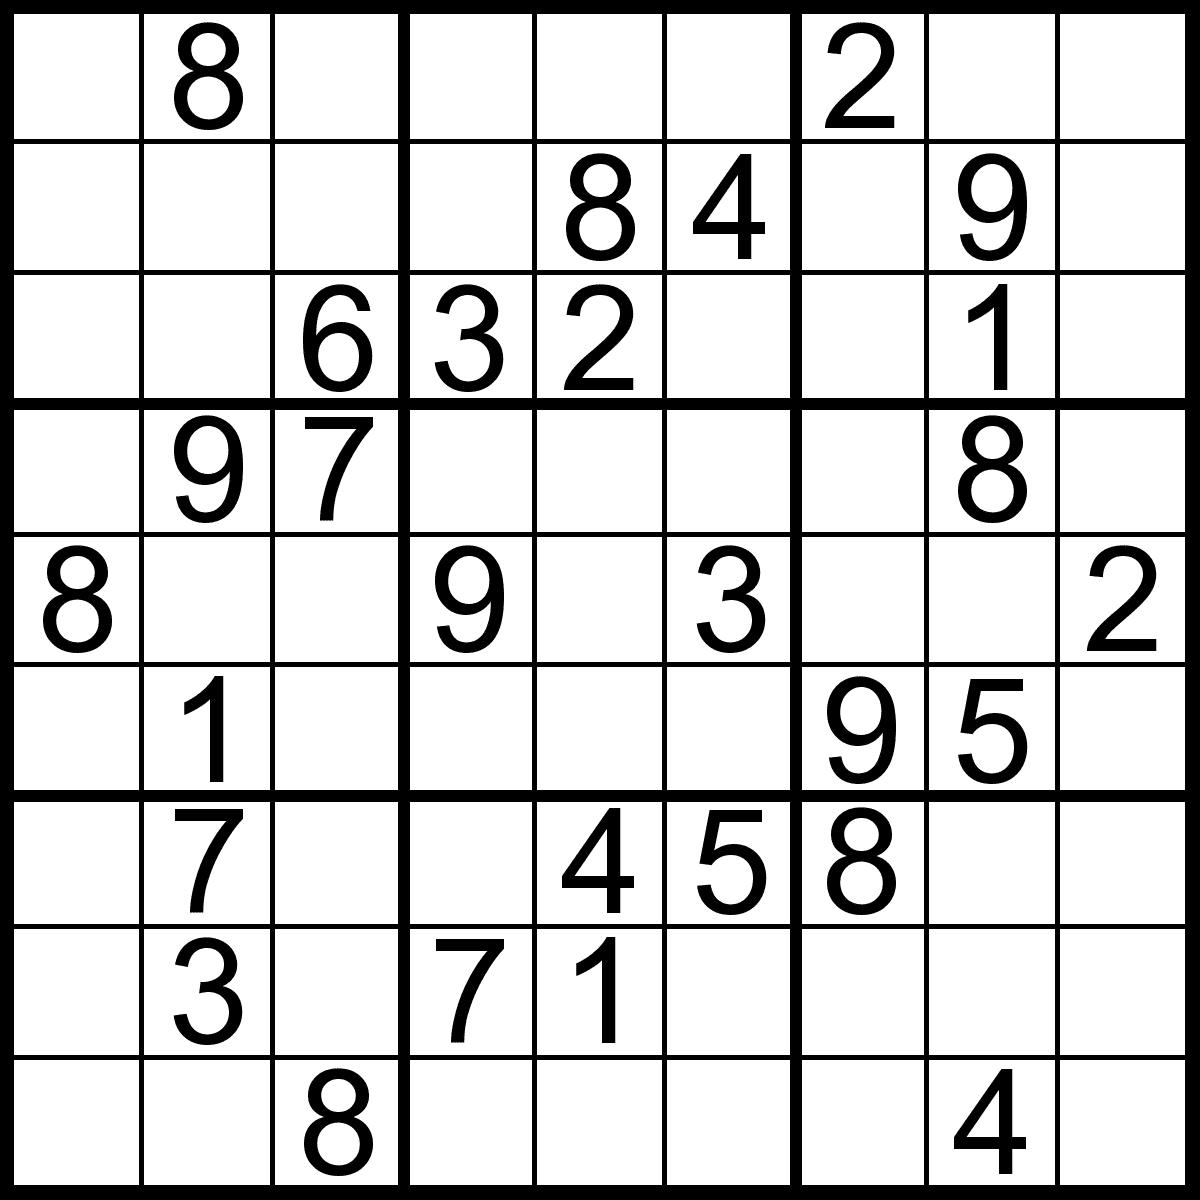 Easy Sudoku Puzzles Online